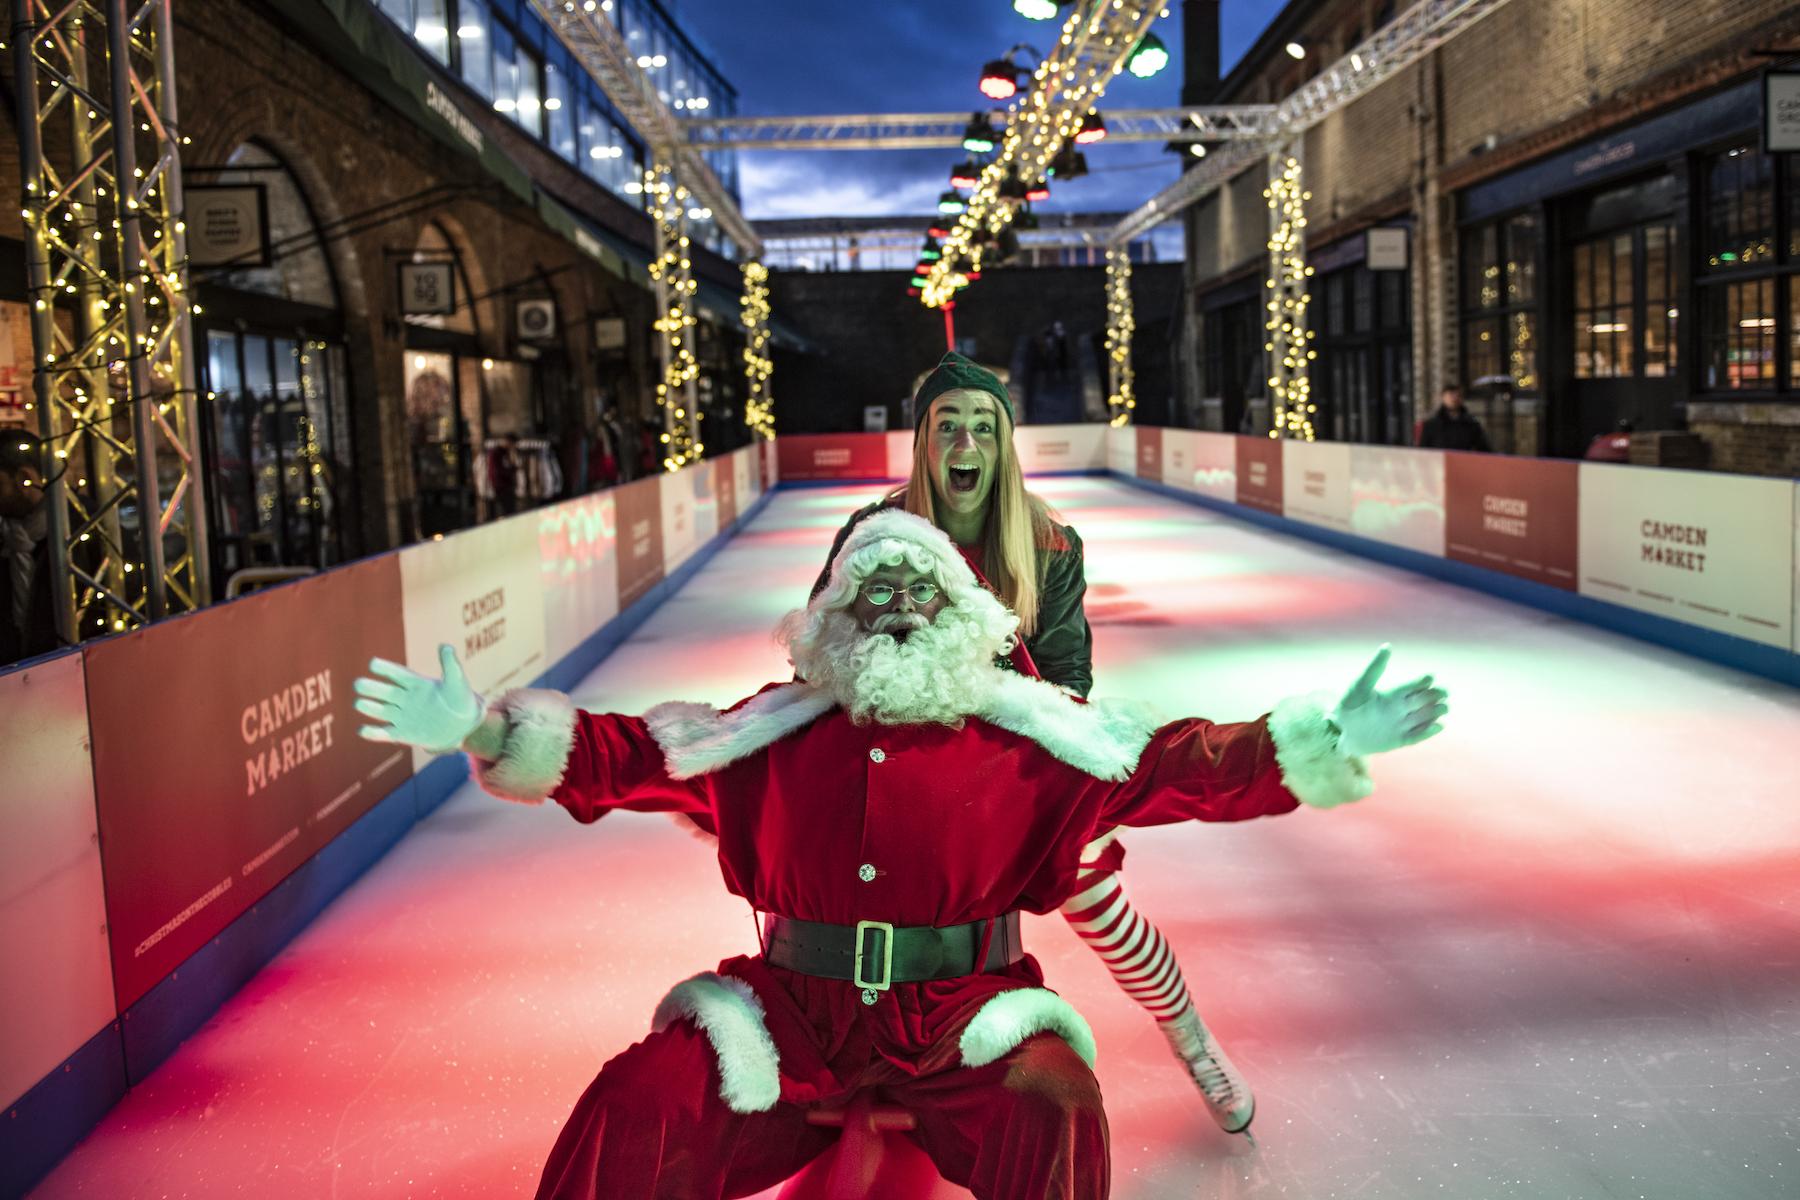 christmas-ice-rink_hero-desktop_CM-website1